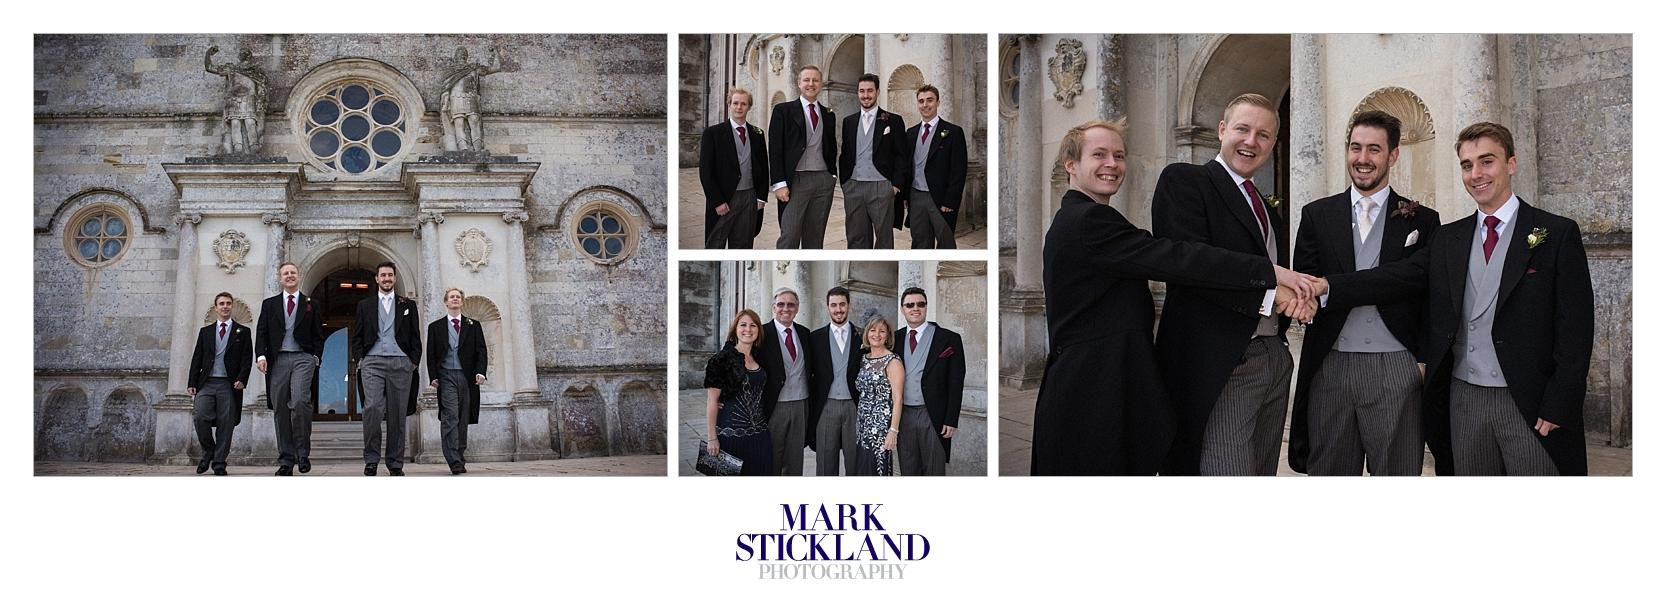 lulworth_castle_wedding_dorset_mark stickland photography.04